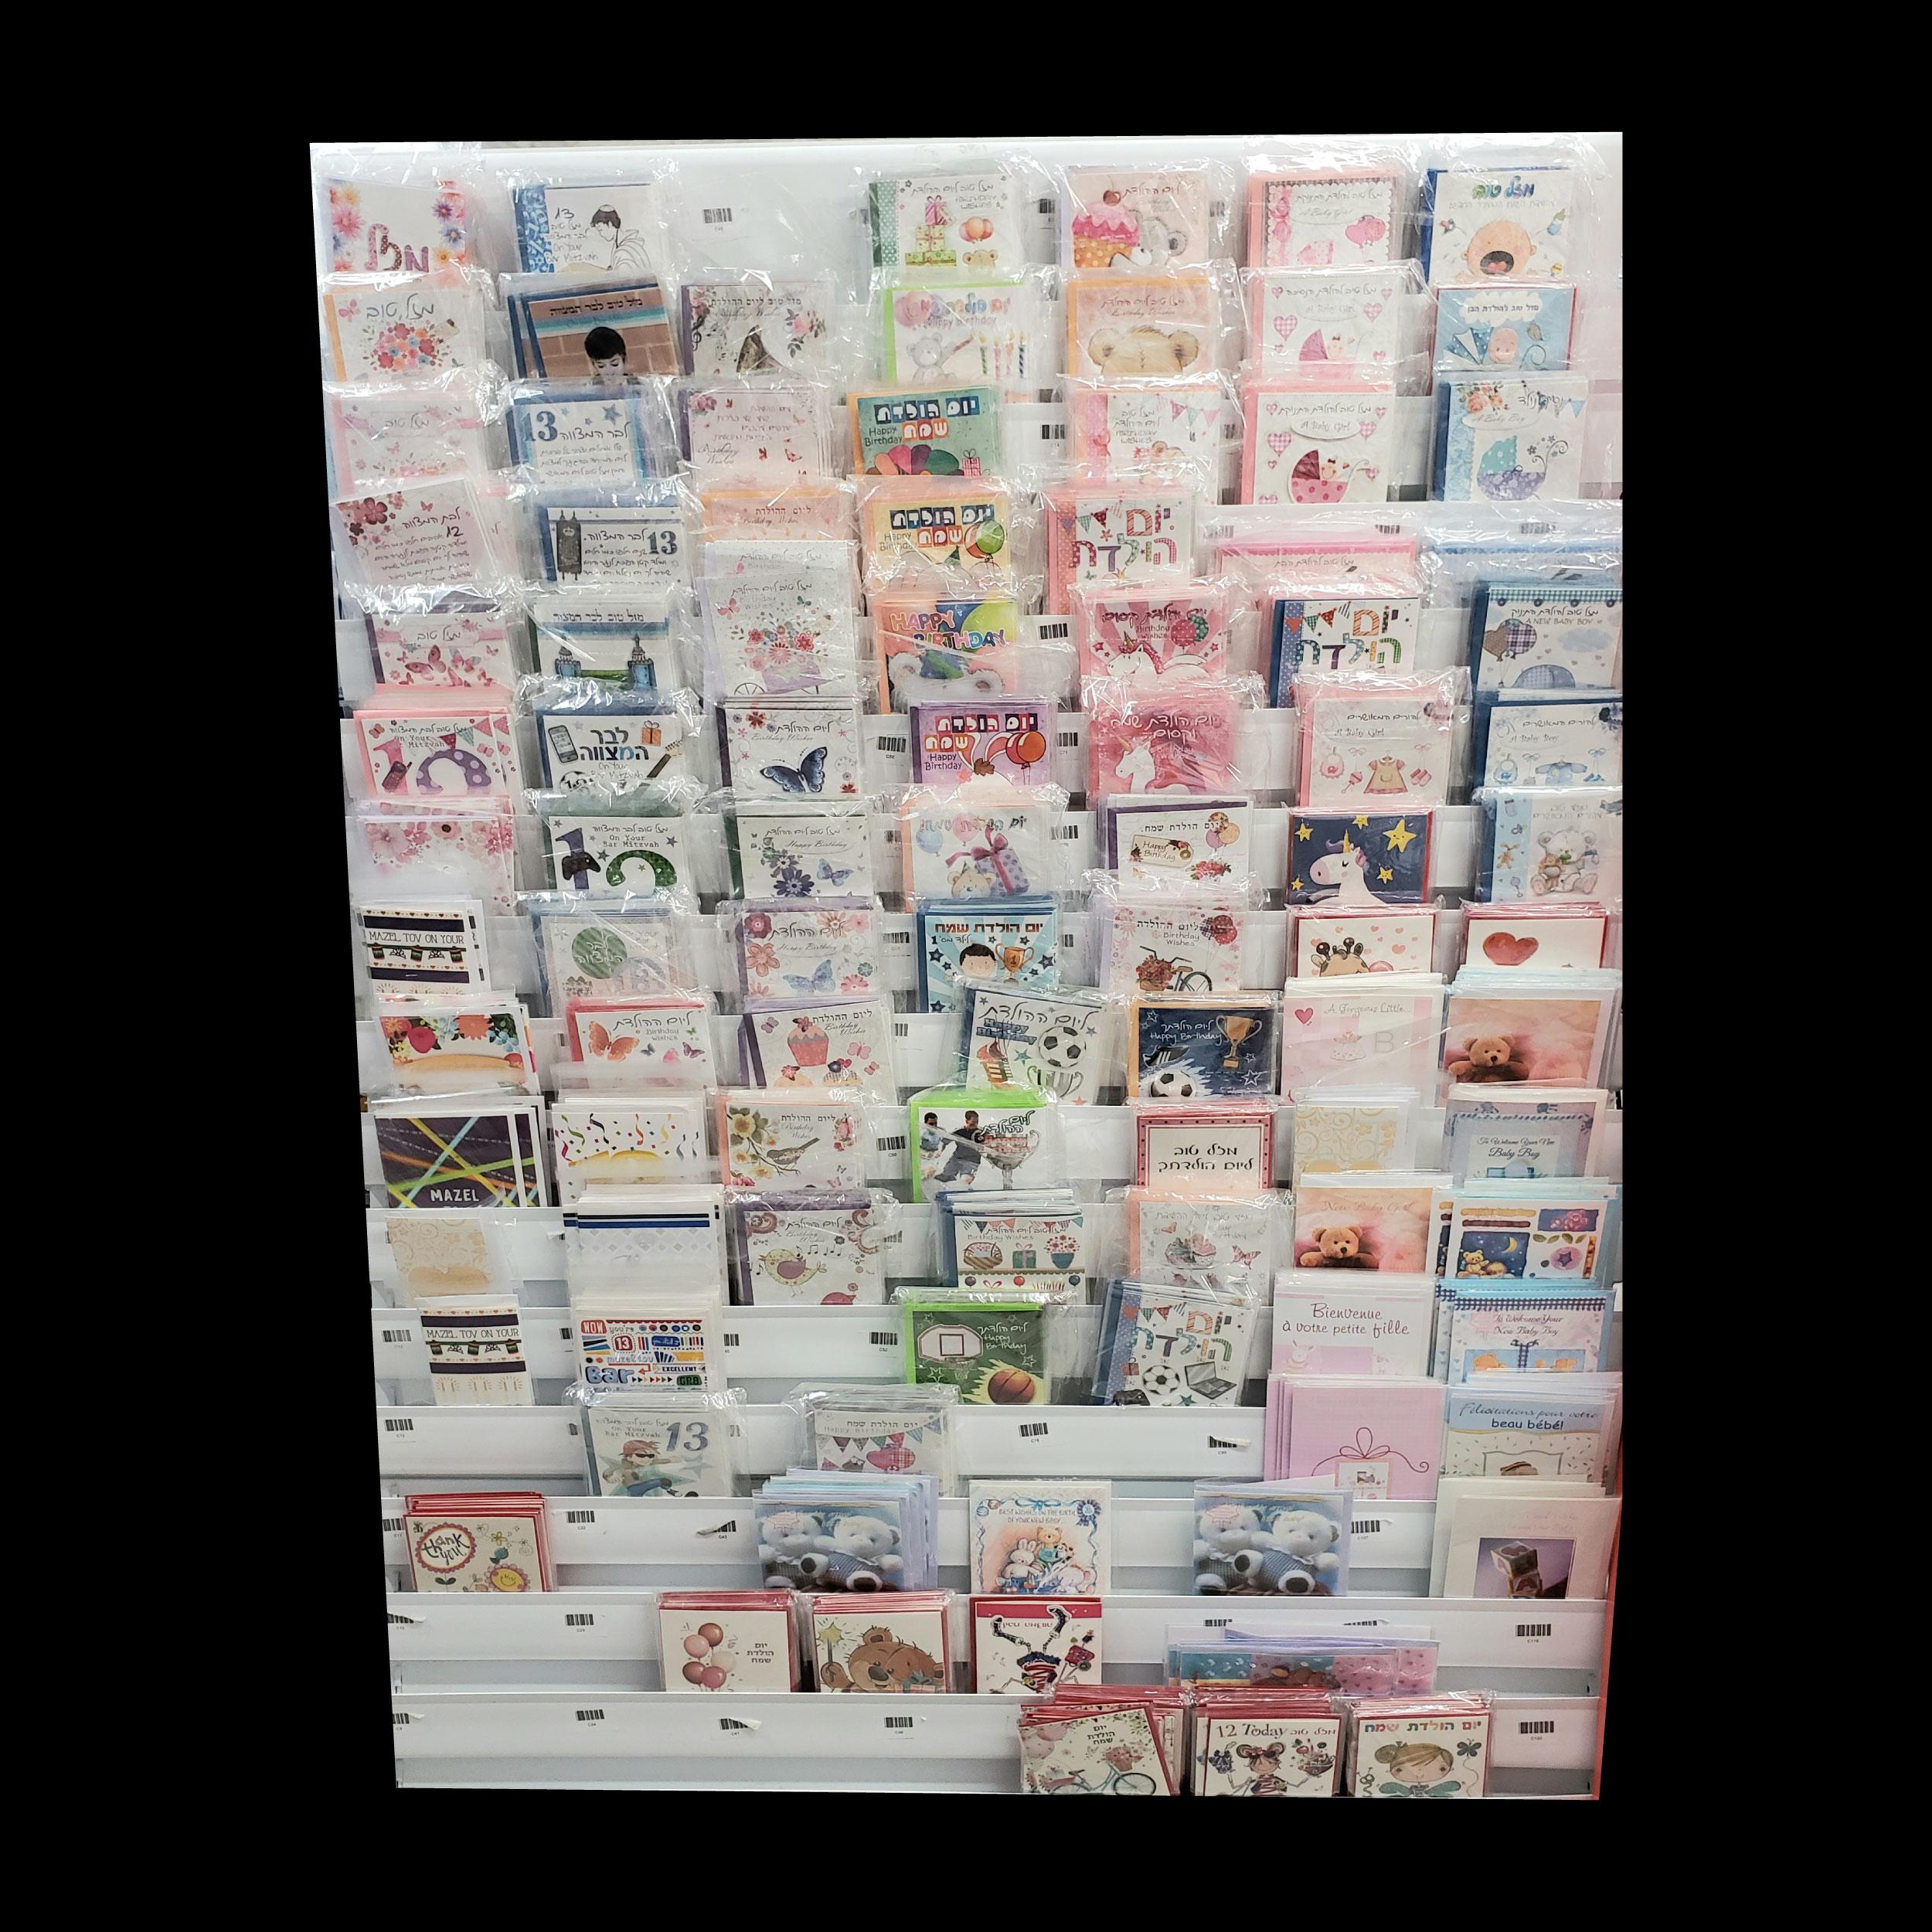 cardslarge.jpg